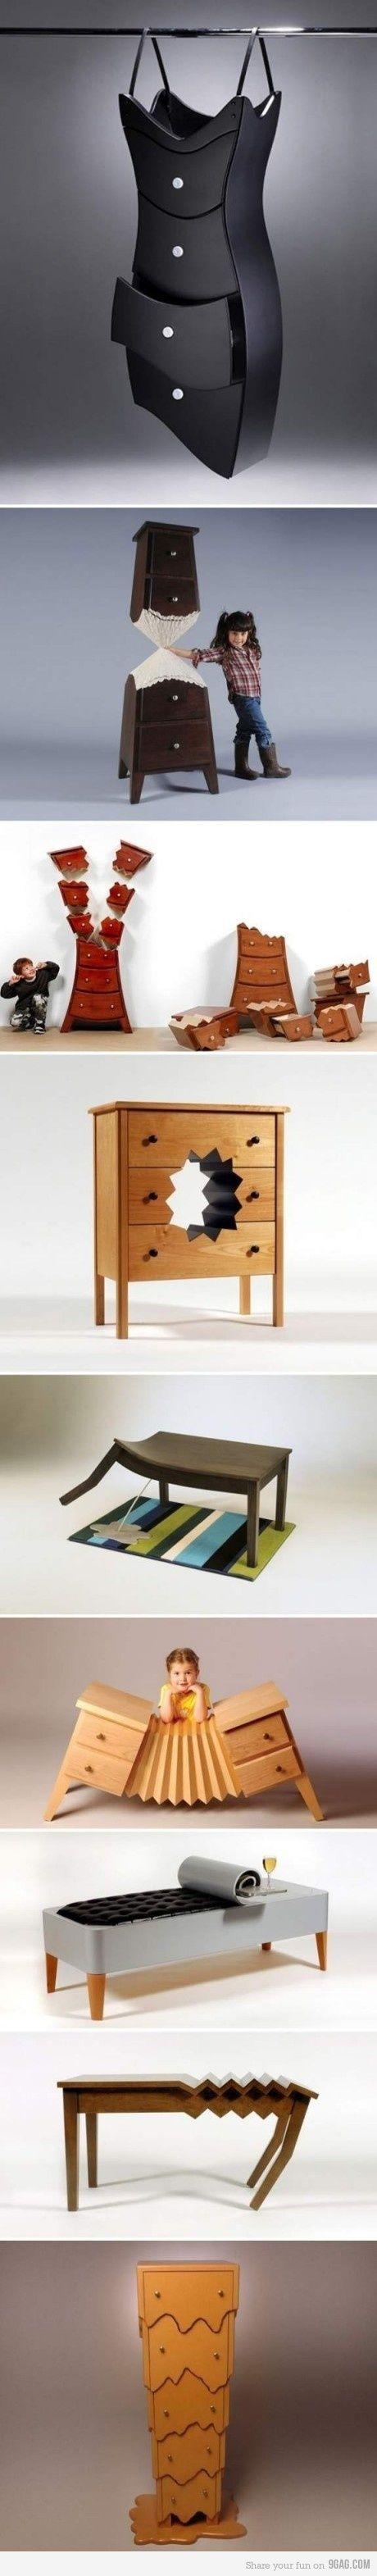 Unique furniture design - Crazy Furniture Cool